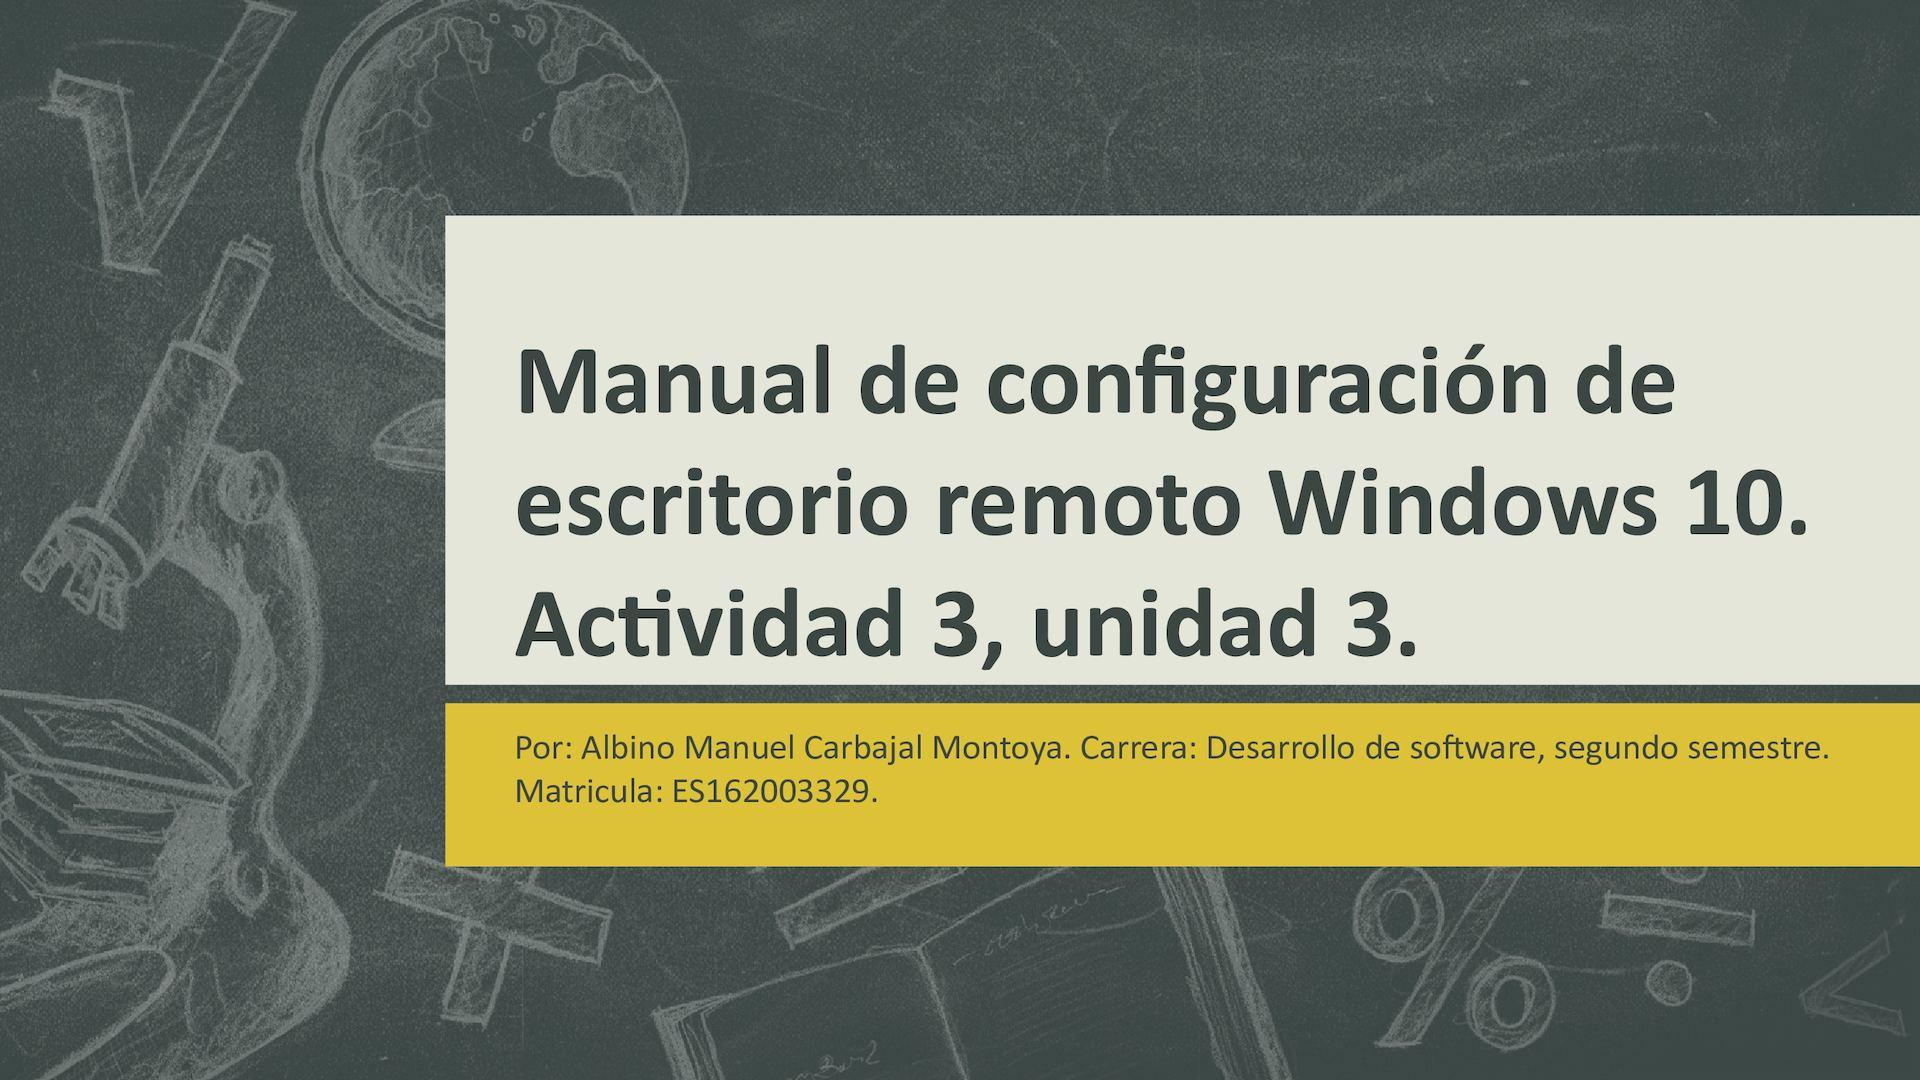 Manual De Configuracion De Escritorio Remoto Windows 10 Calameo